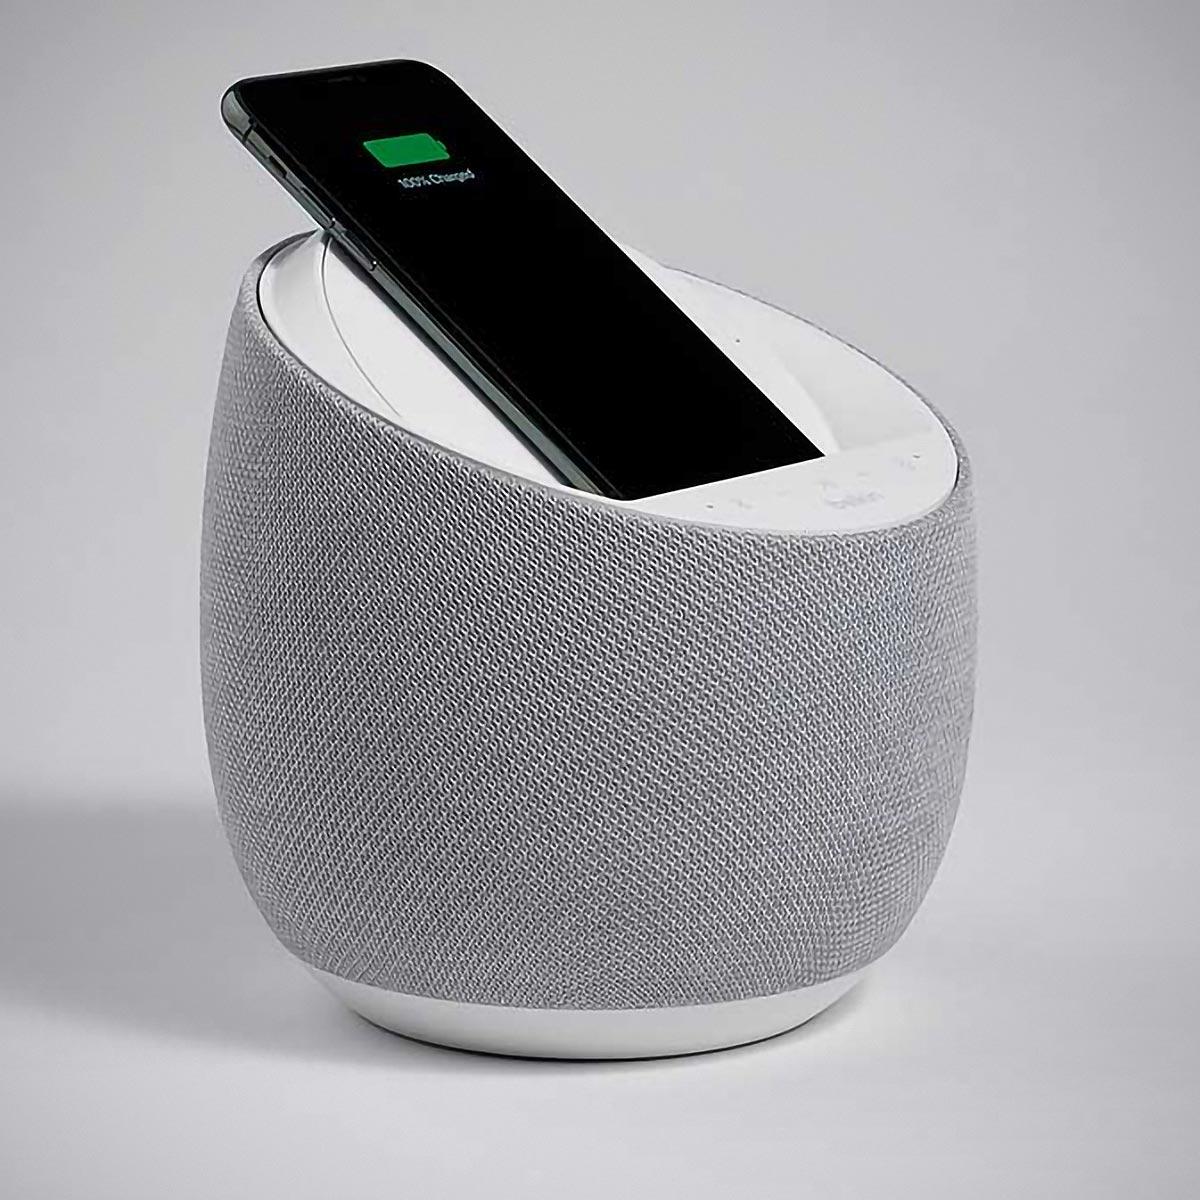 Belkin Soundform Elite Hi-Fi Smart Speaker + Wireless Charger